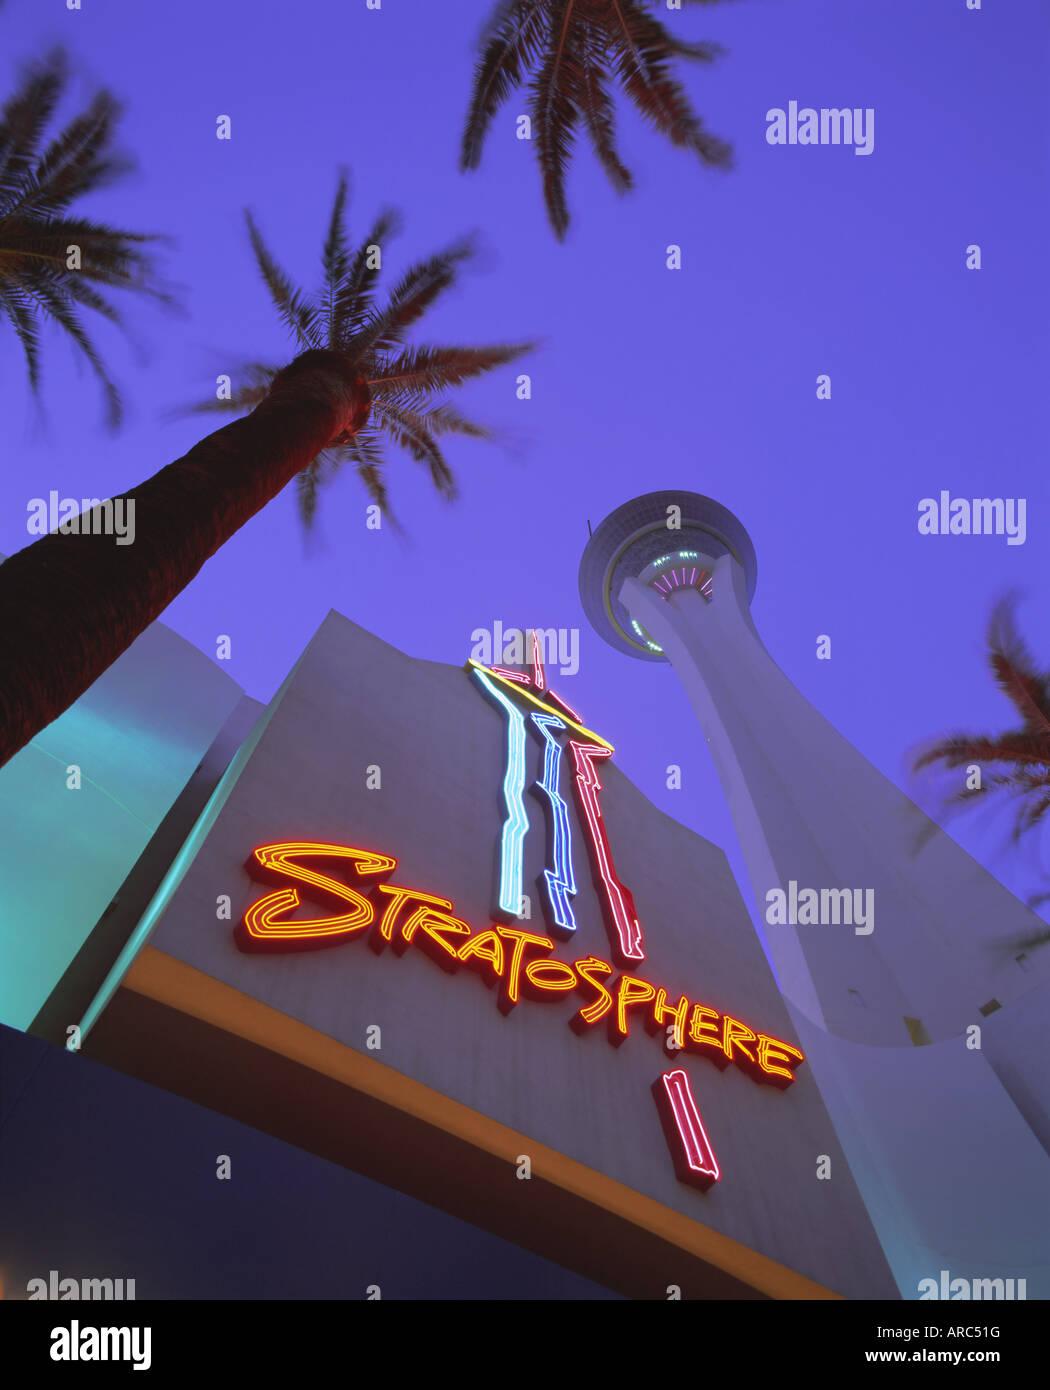 Stratosphere Tower, Las Vegas, Nevada, USA, North America - Stock Image